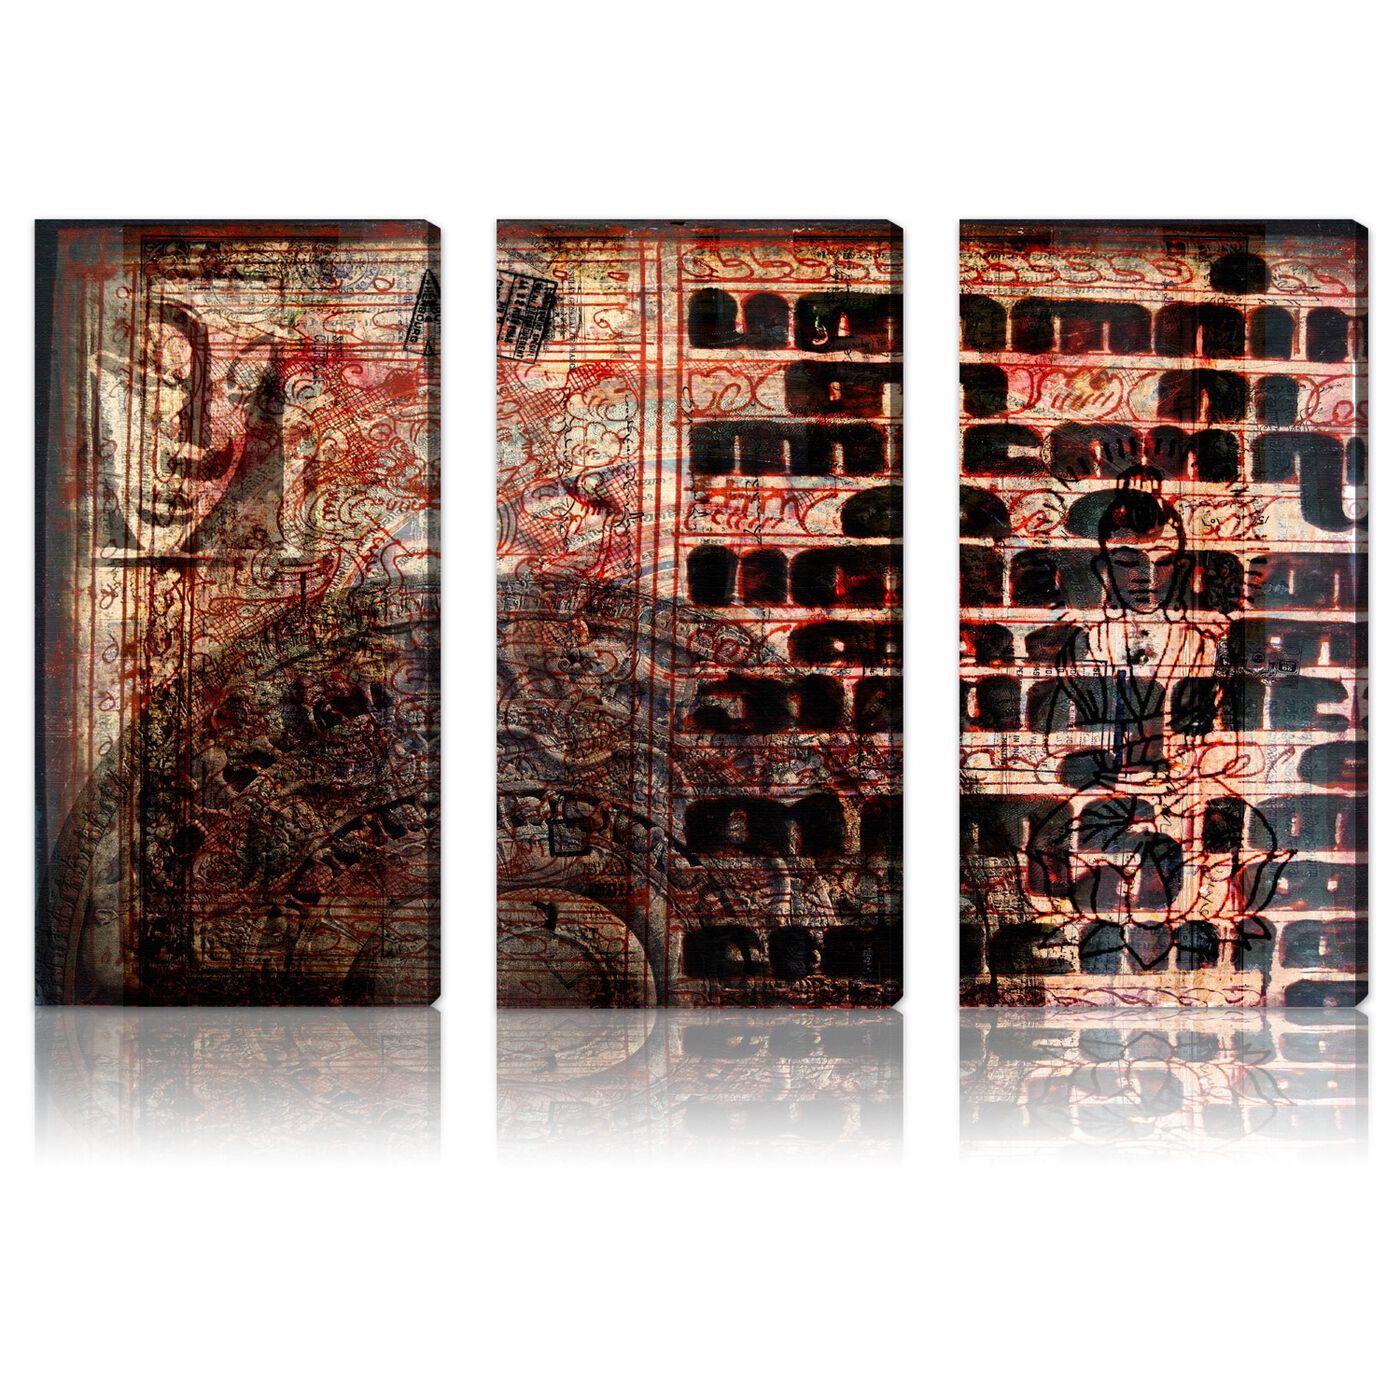 Karma - 3 Panels